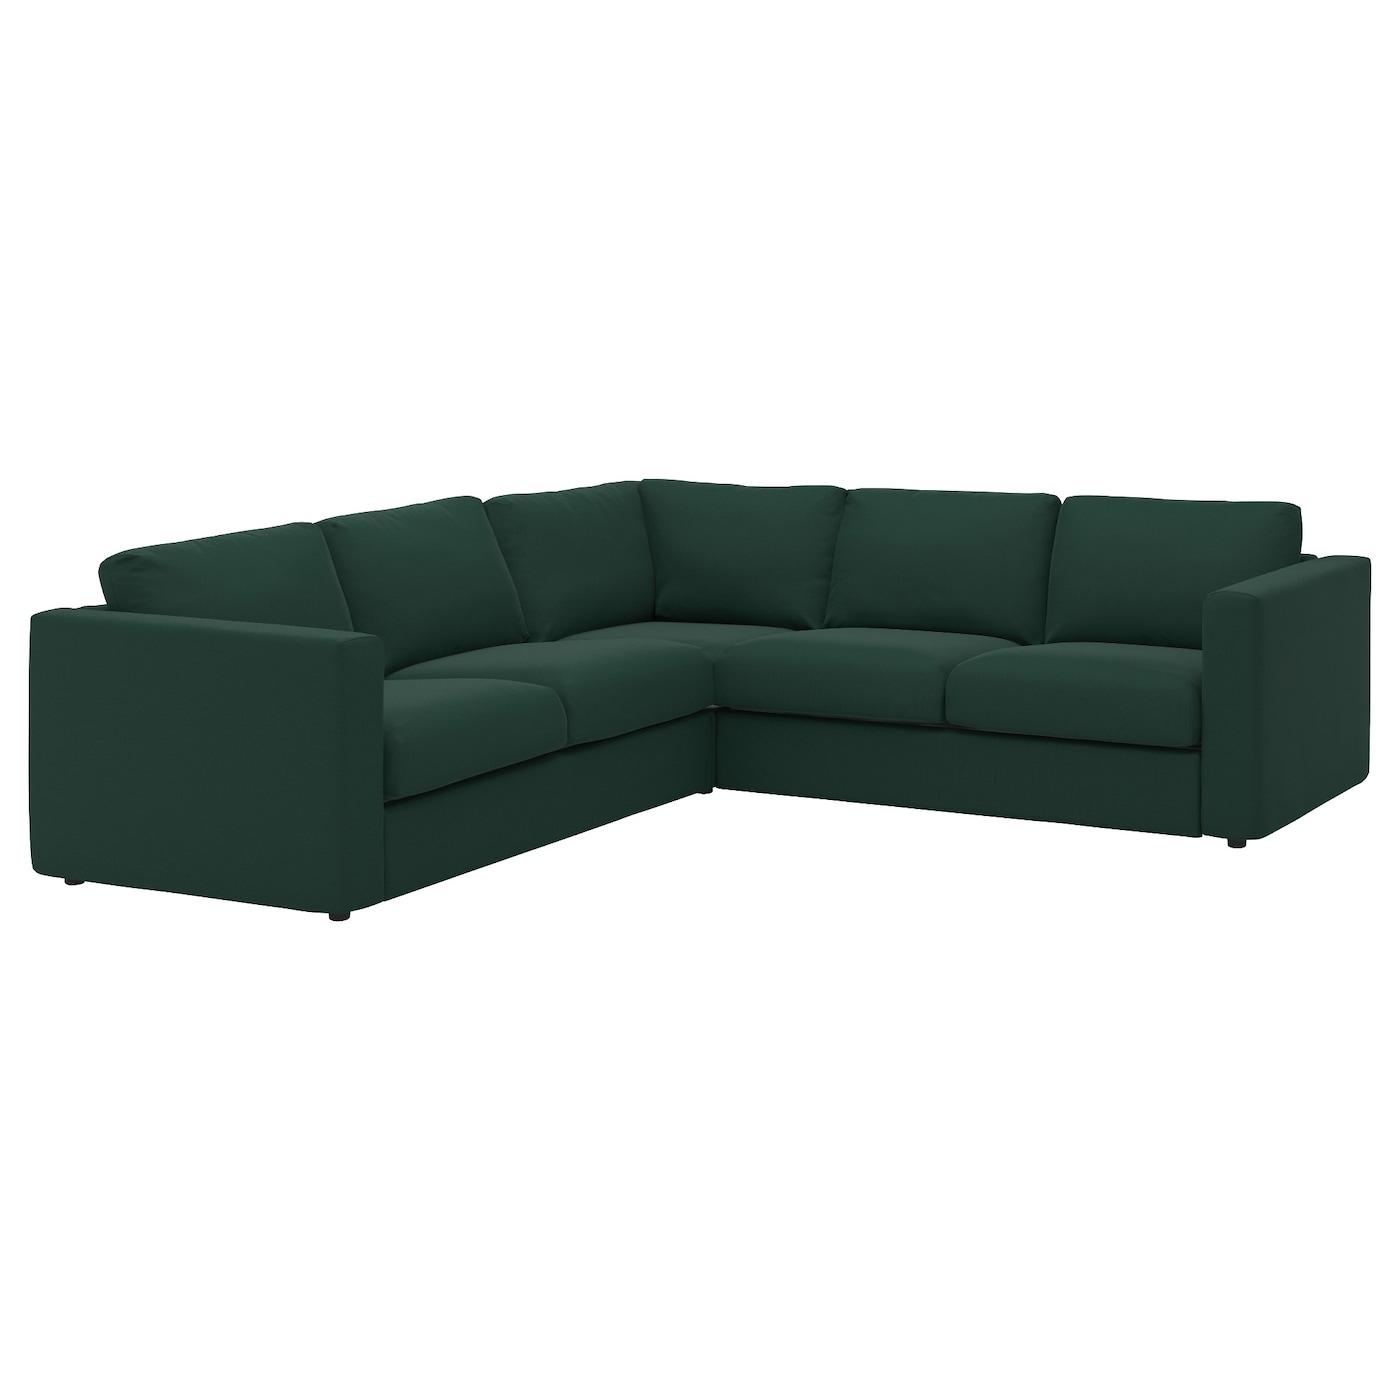 Vimle Corner Sofa 4 Seat Gunnared Dark Green Ikea